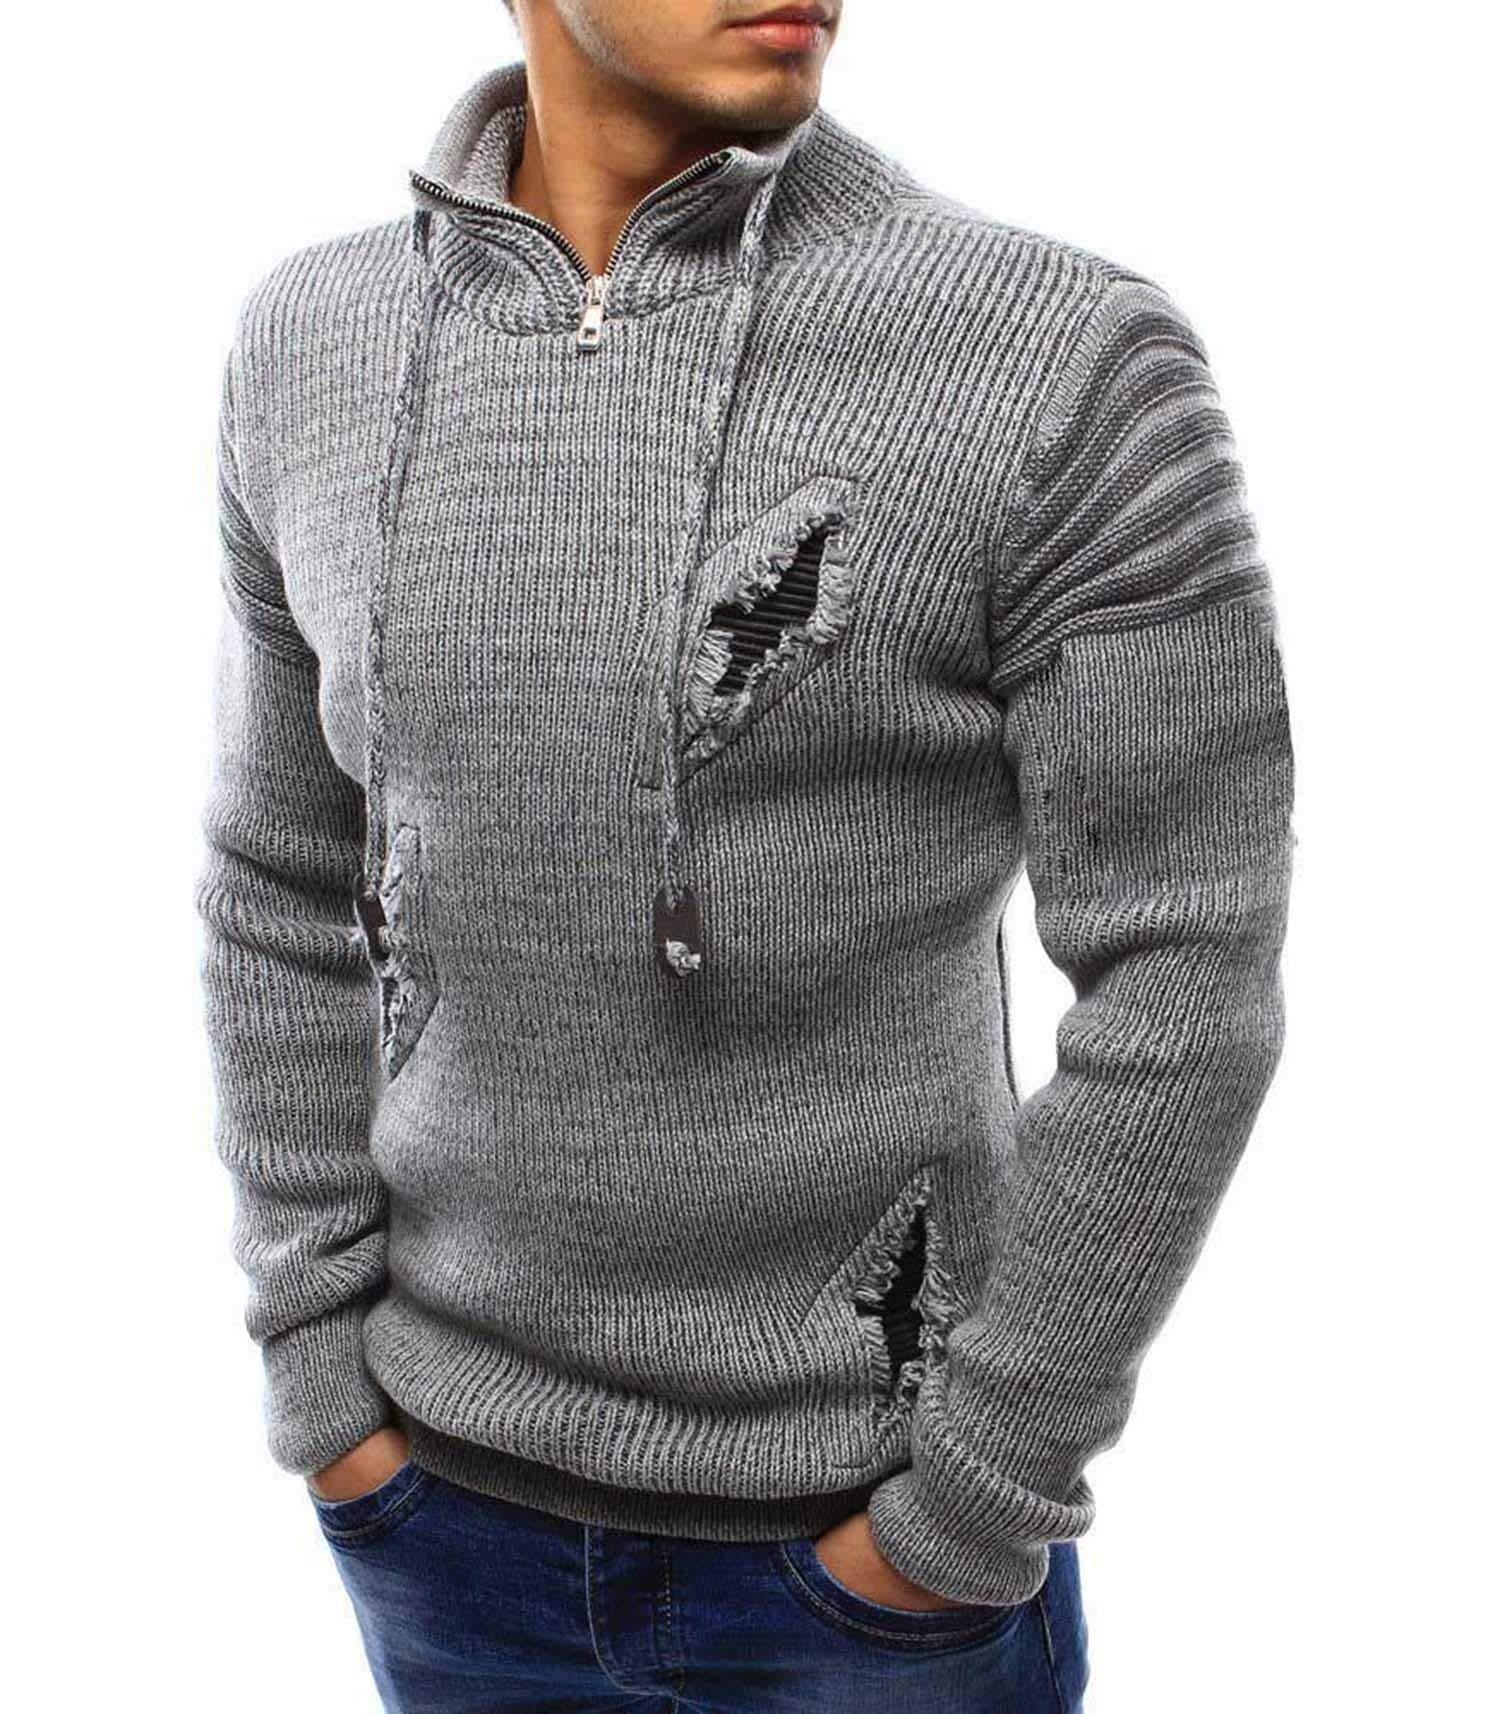 Aderu C Sweaters Sweater Zipper Knitting Unlined Pullover Upper Garment Cashmere Light Gray Light Gray